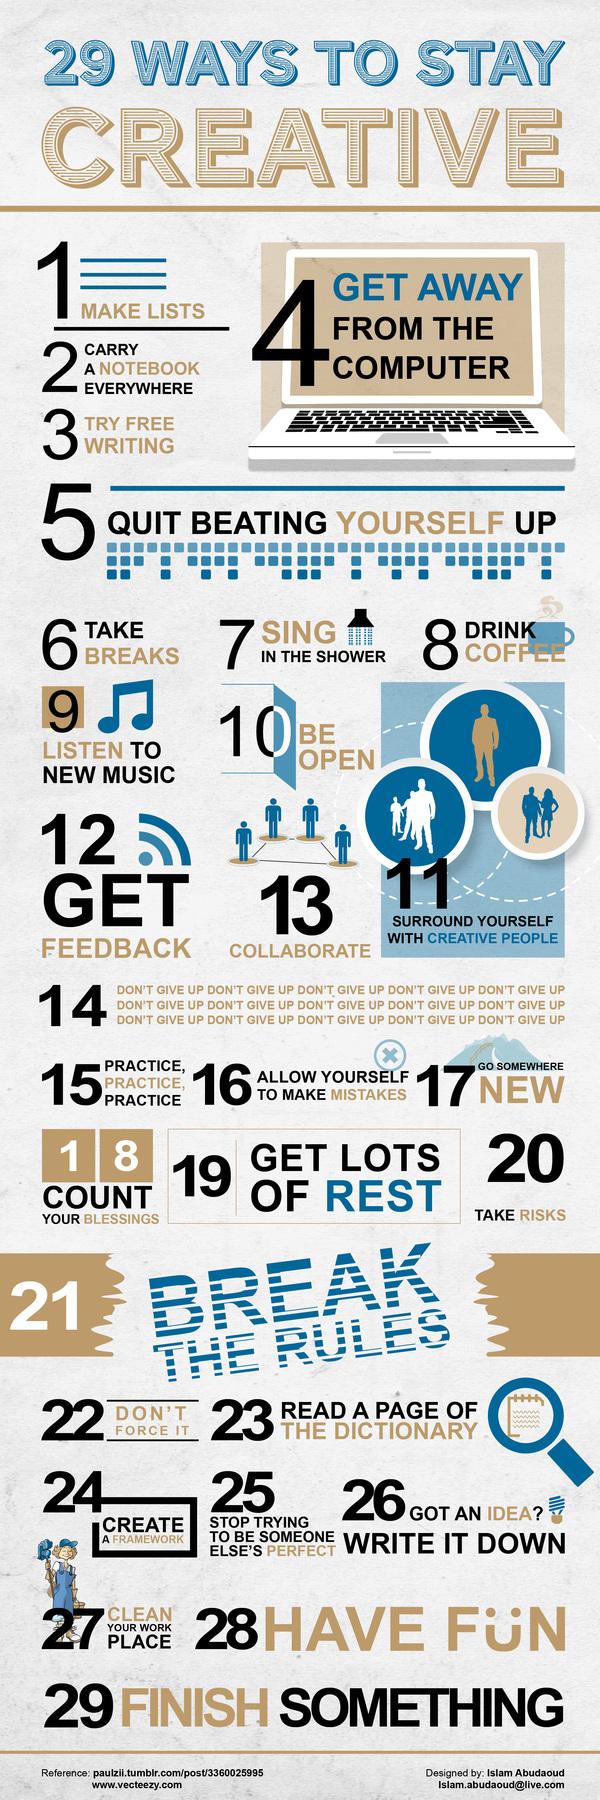 29-ways-creative